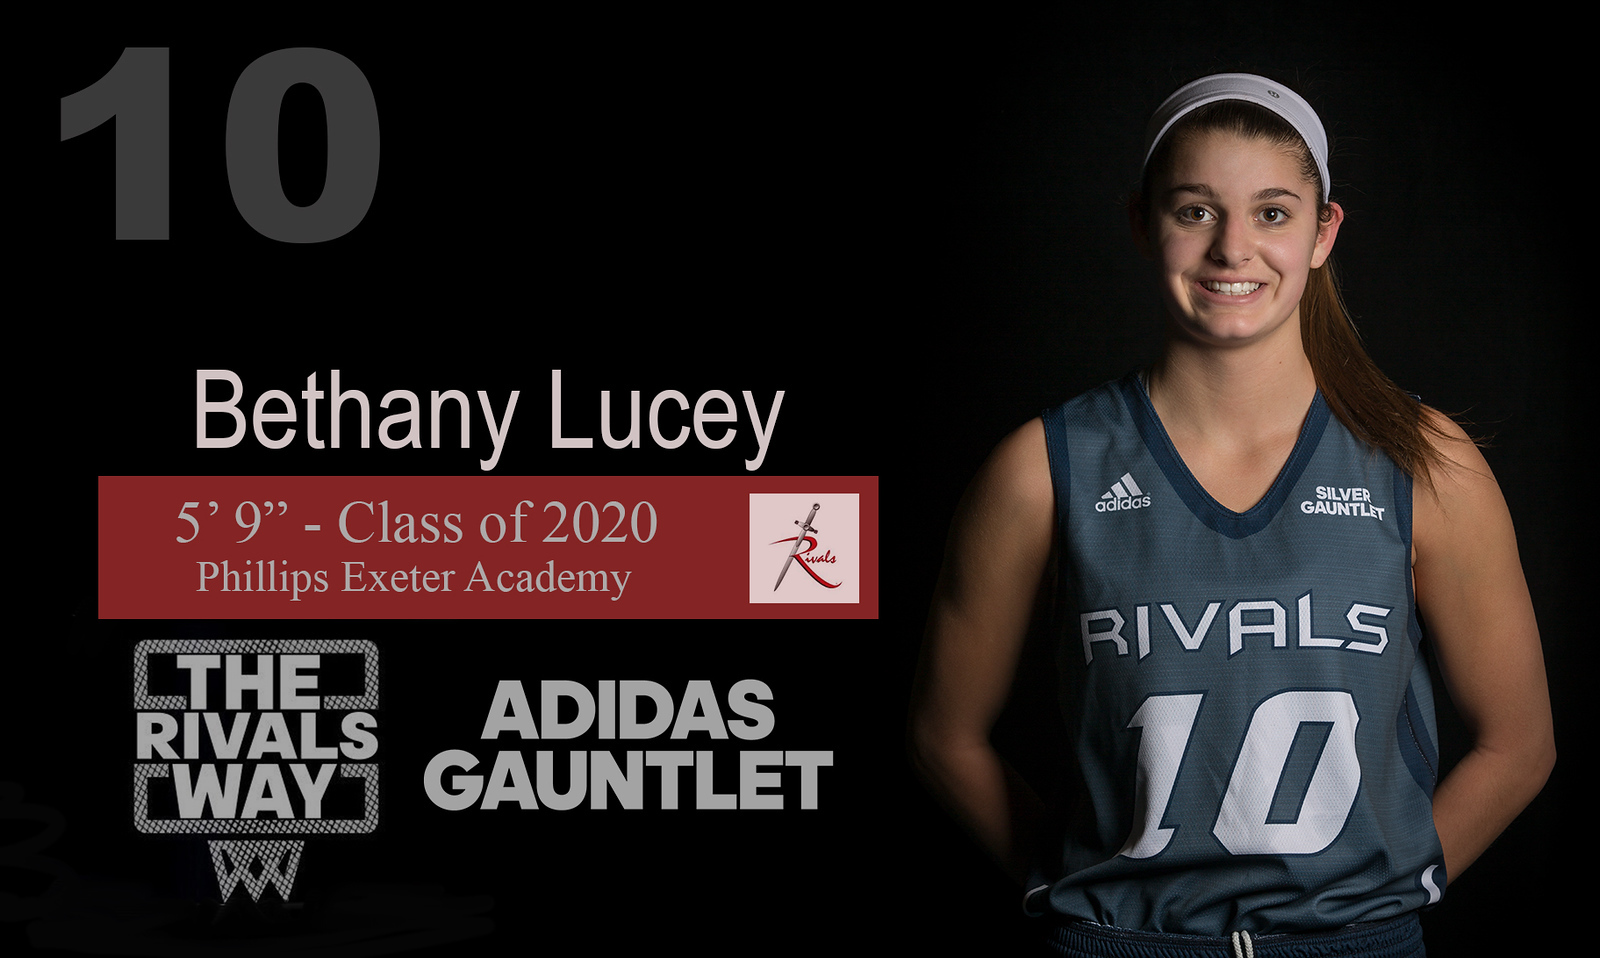 Bethany Lucey